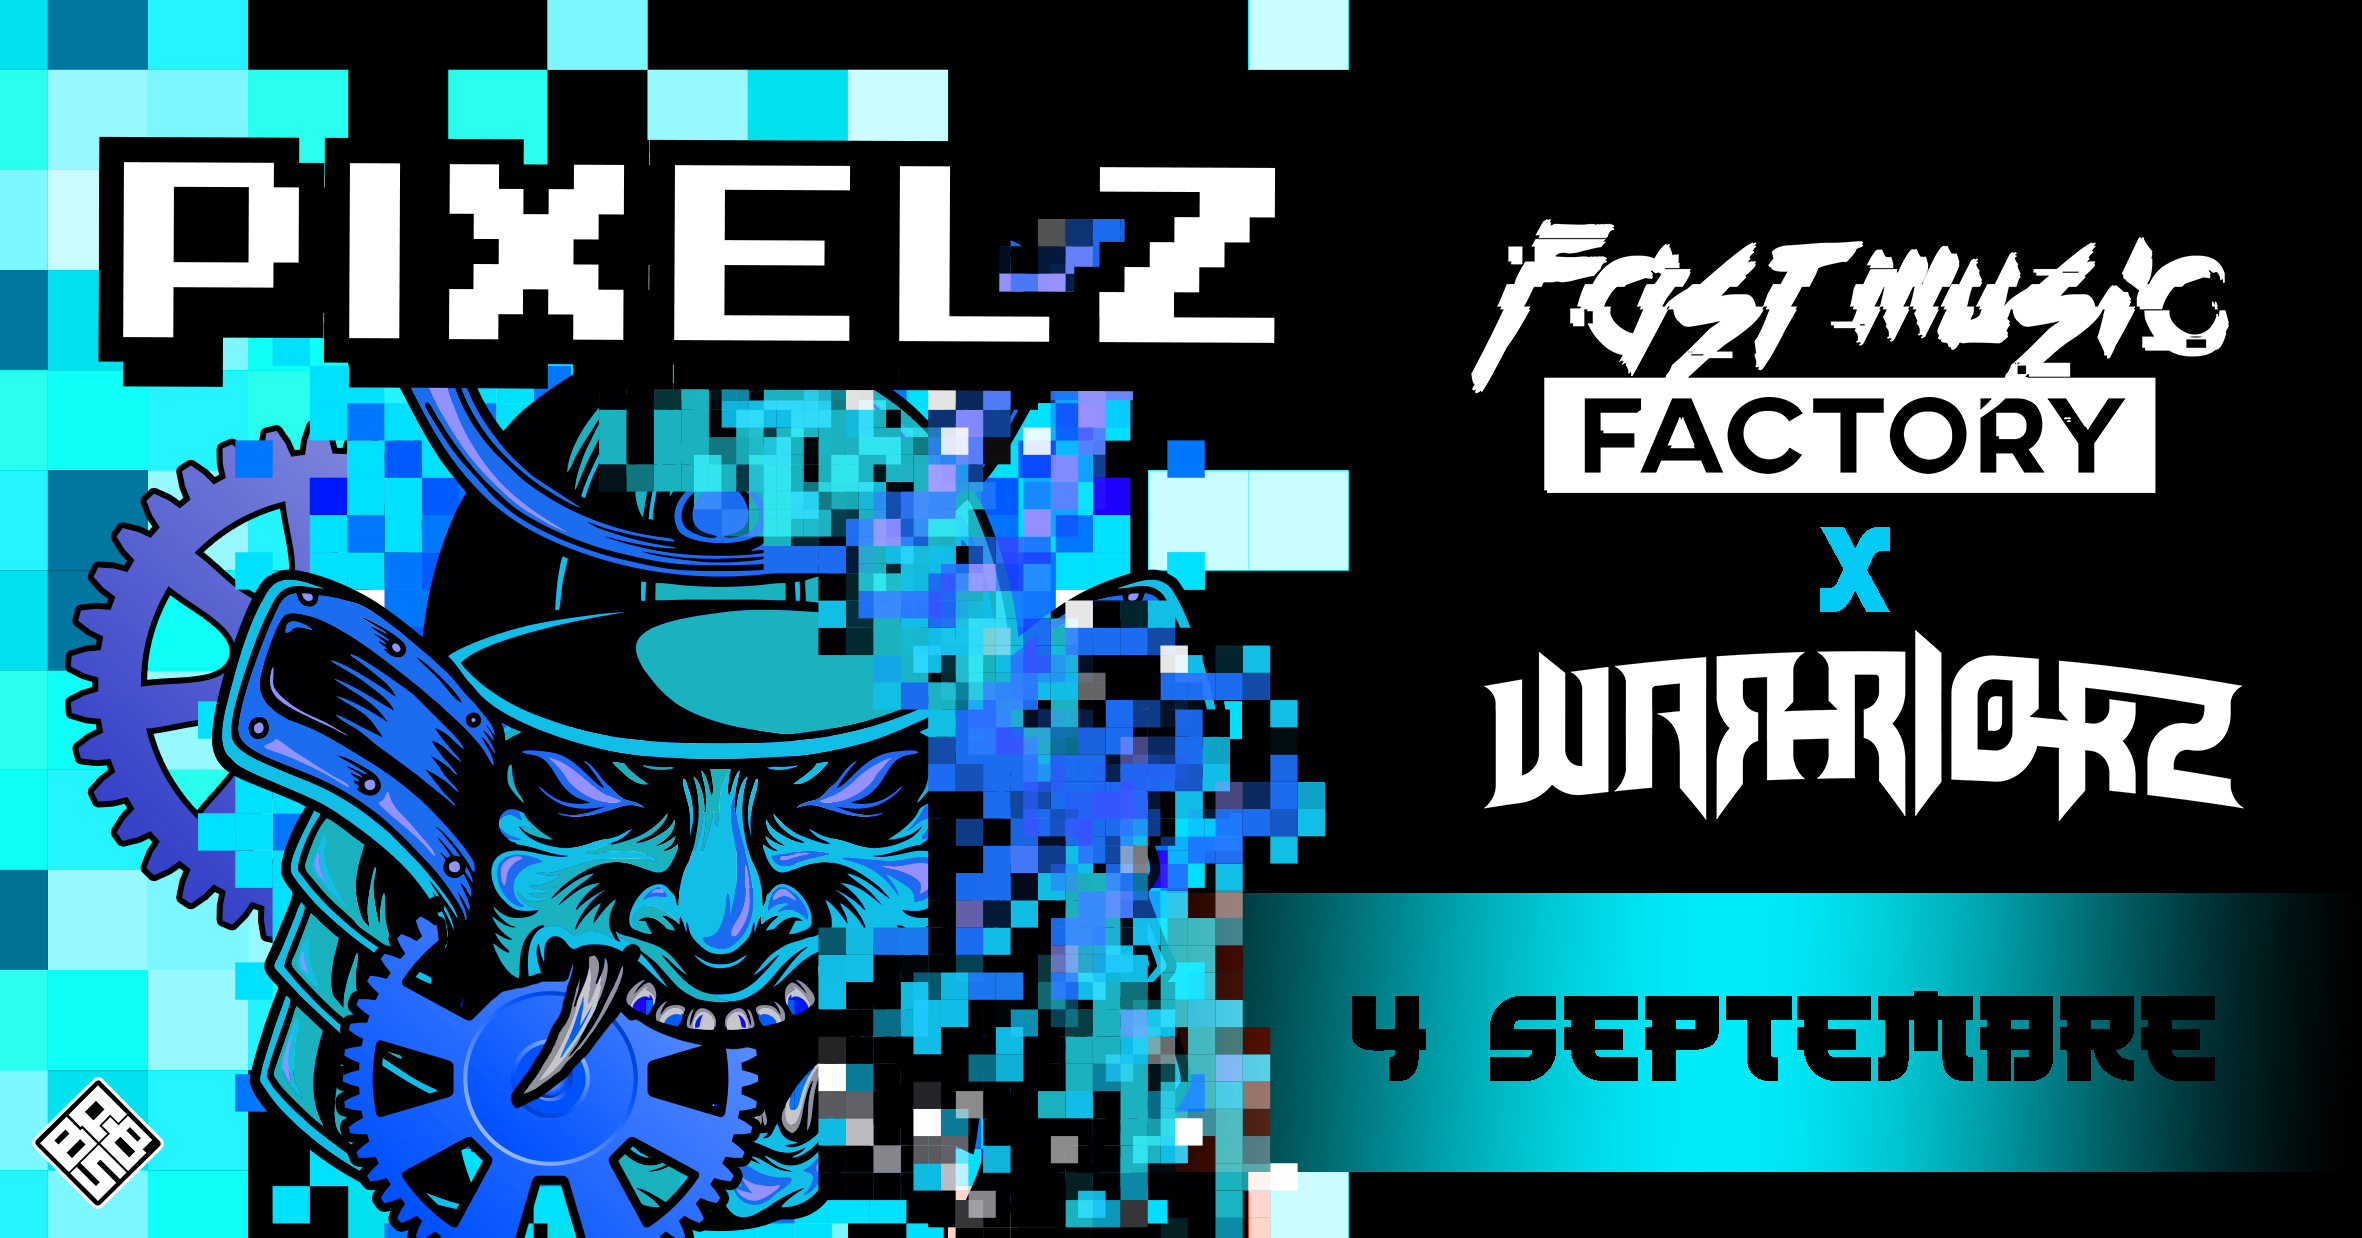 PIXELZ (Warriorz x Fast Music Factory)